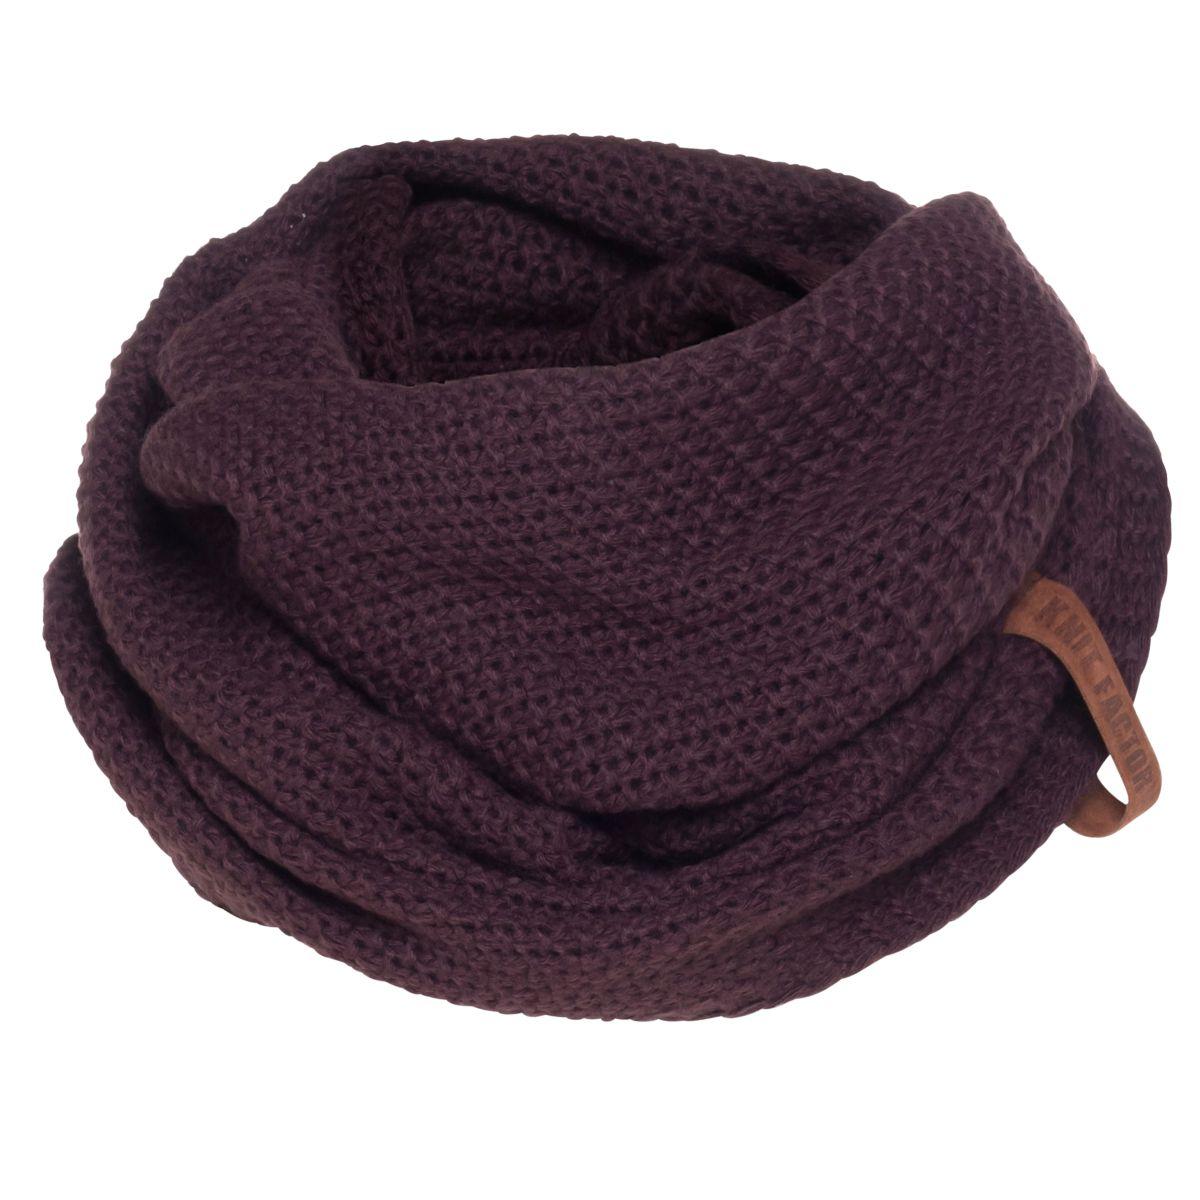 coco infinity scarf aubergine